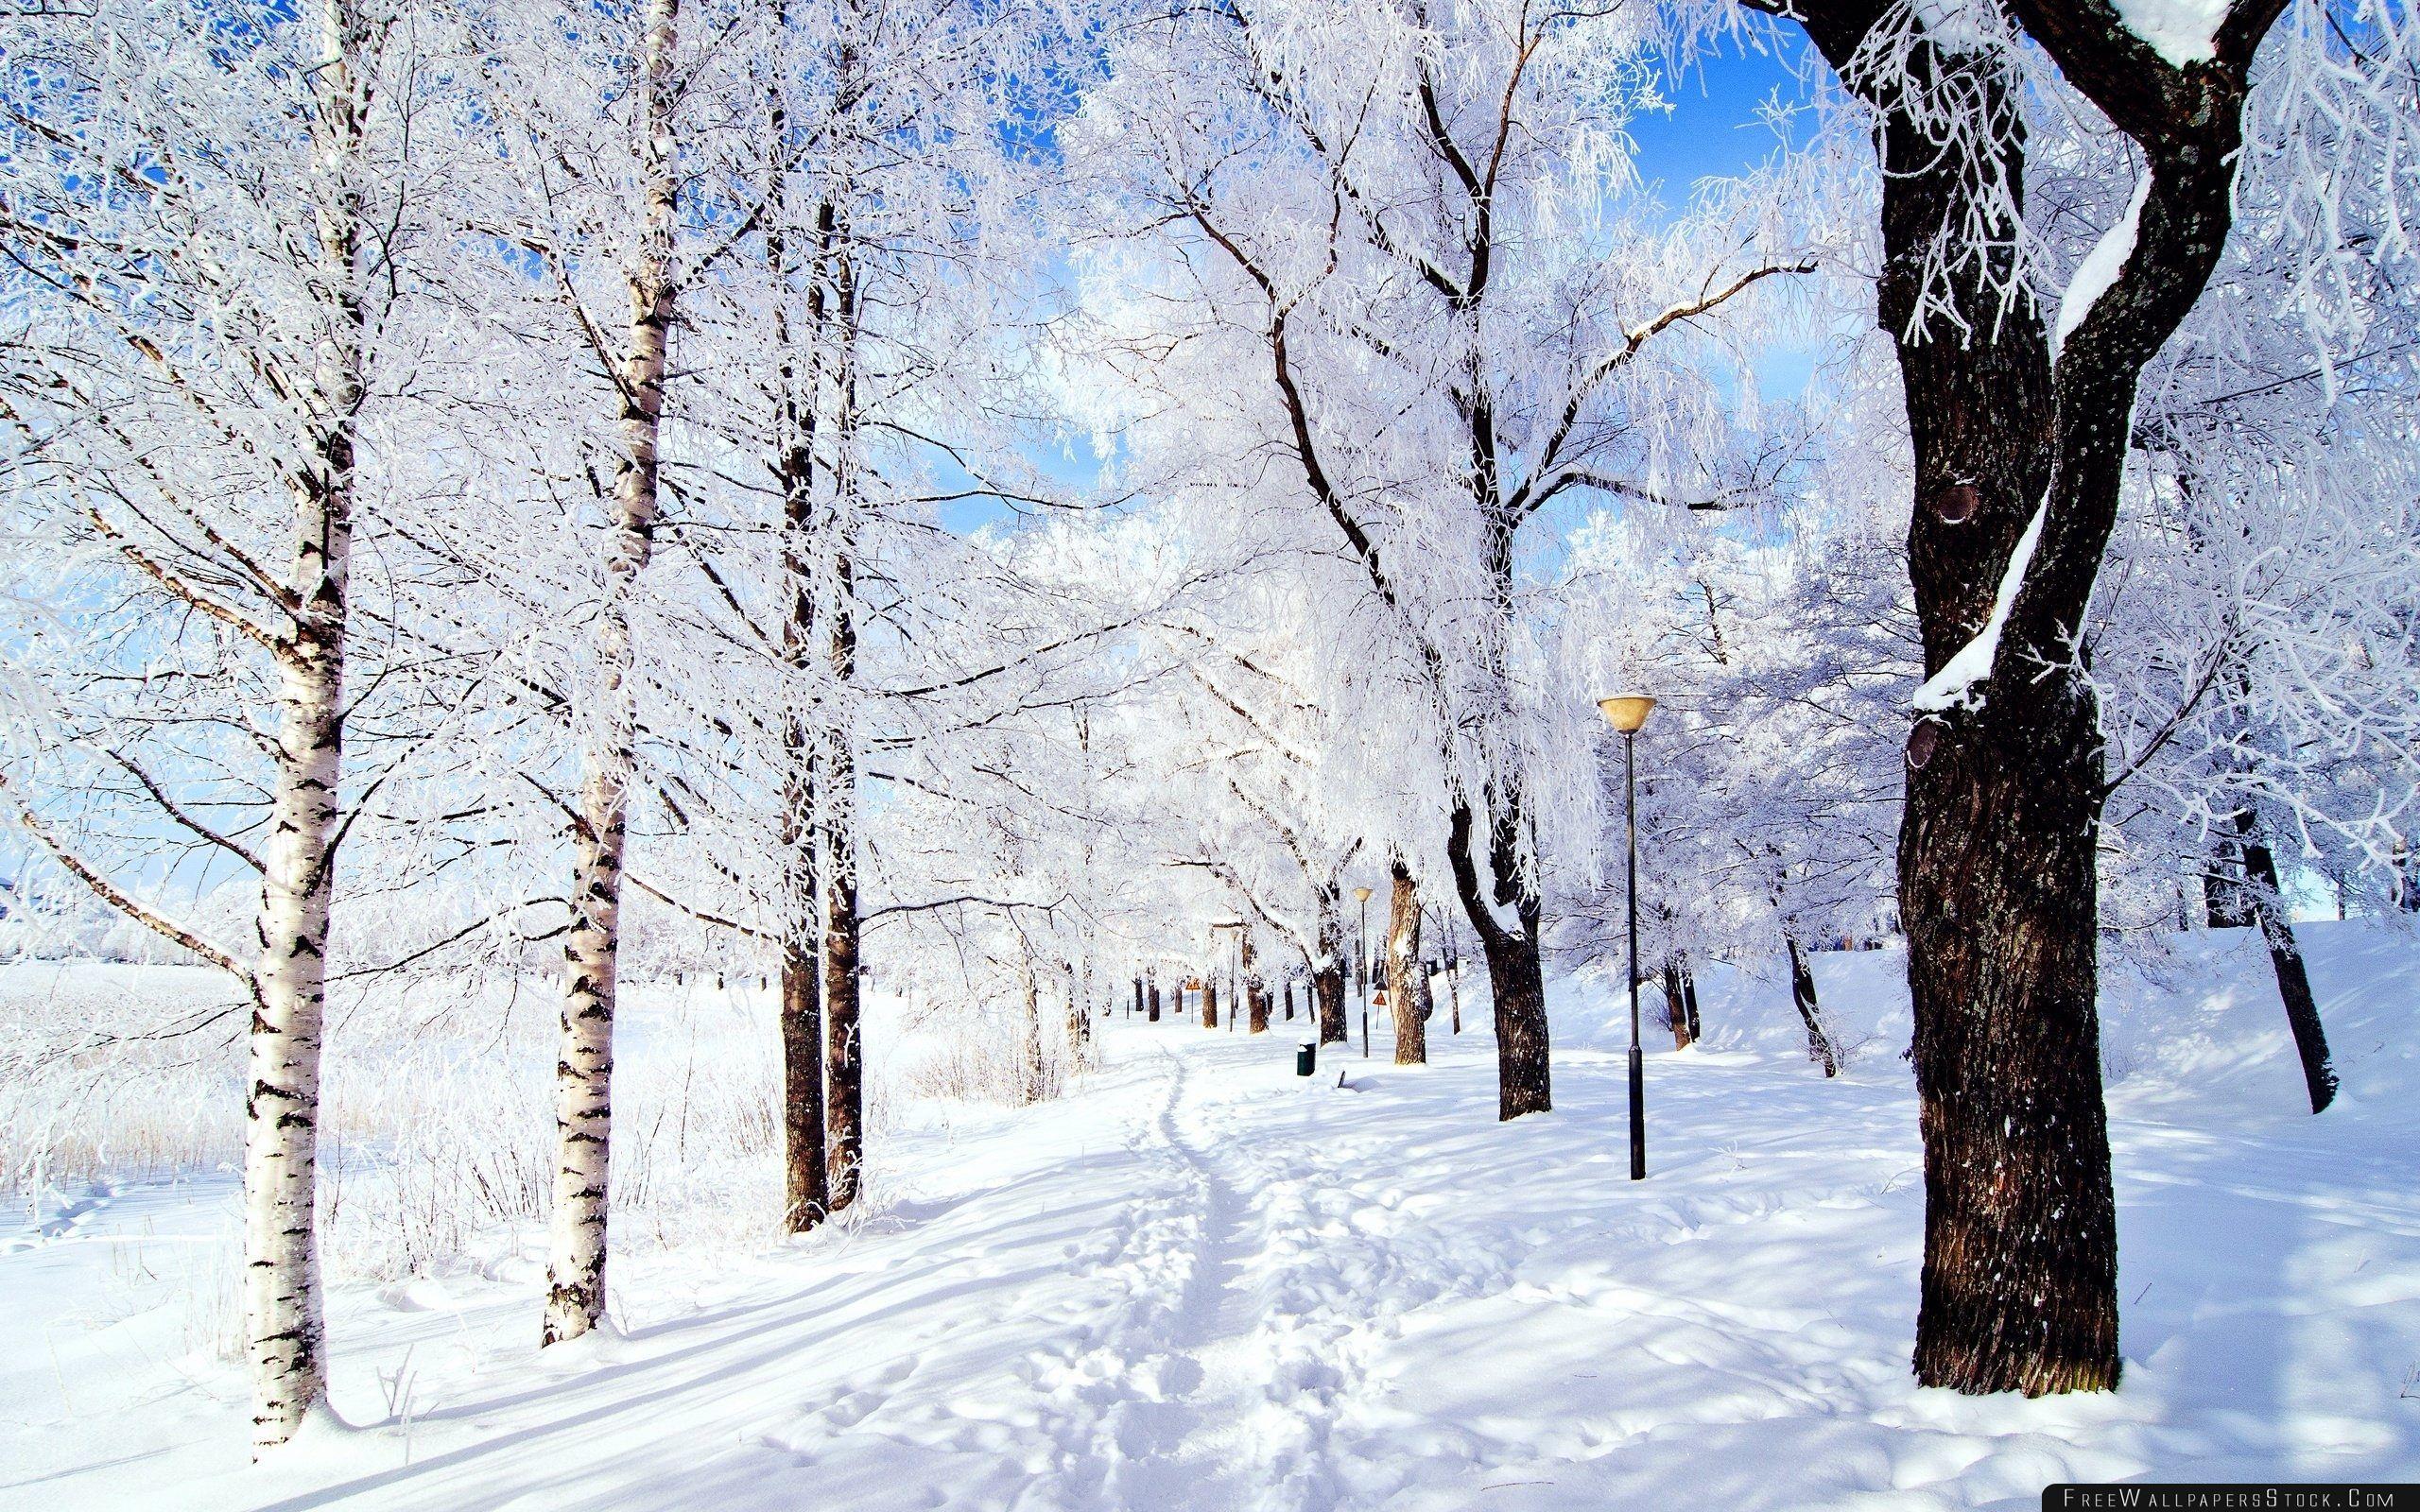 Download Free Wallpaper Winter Wonderland